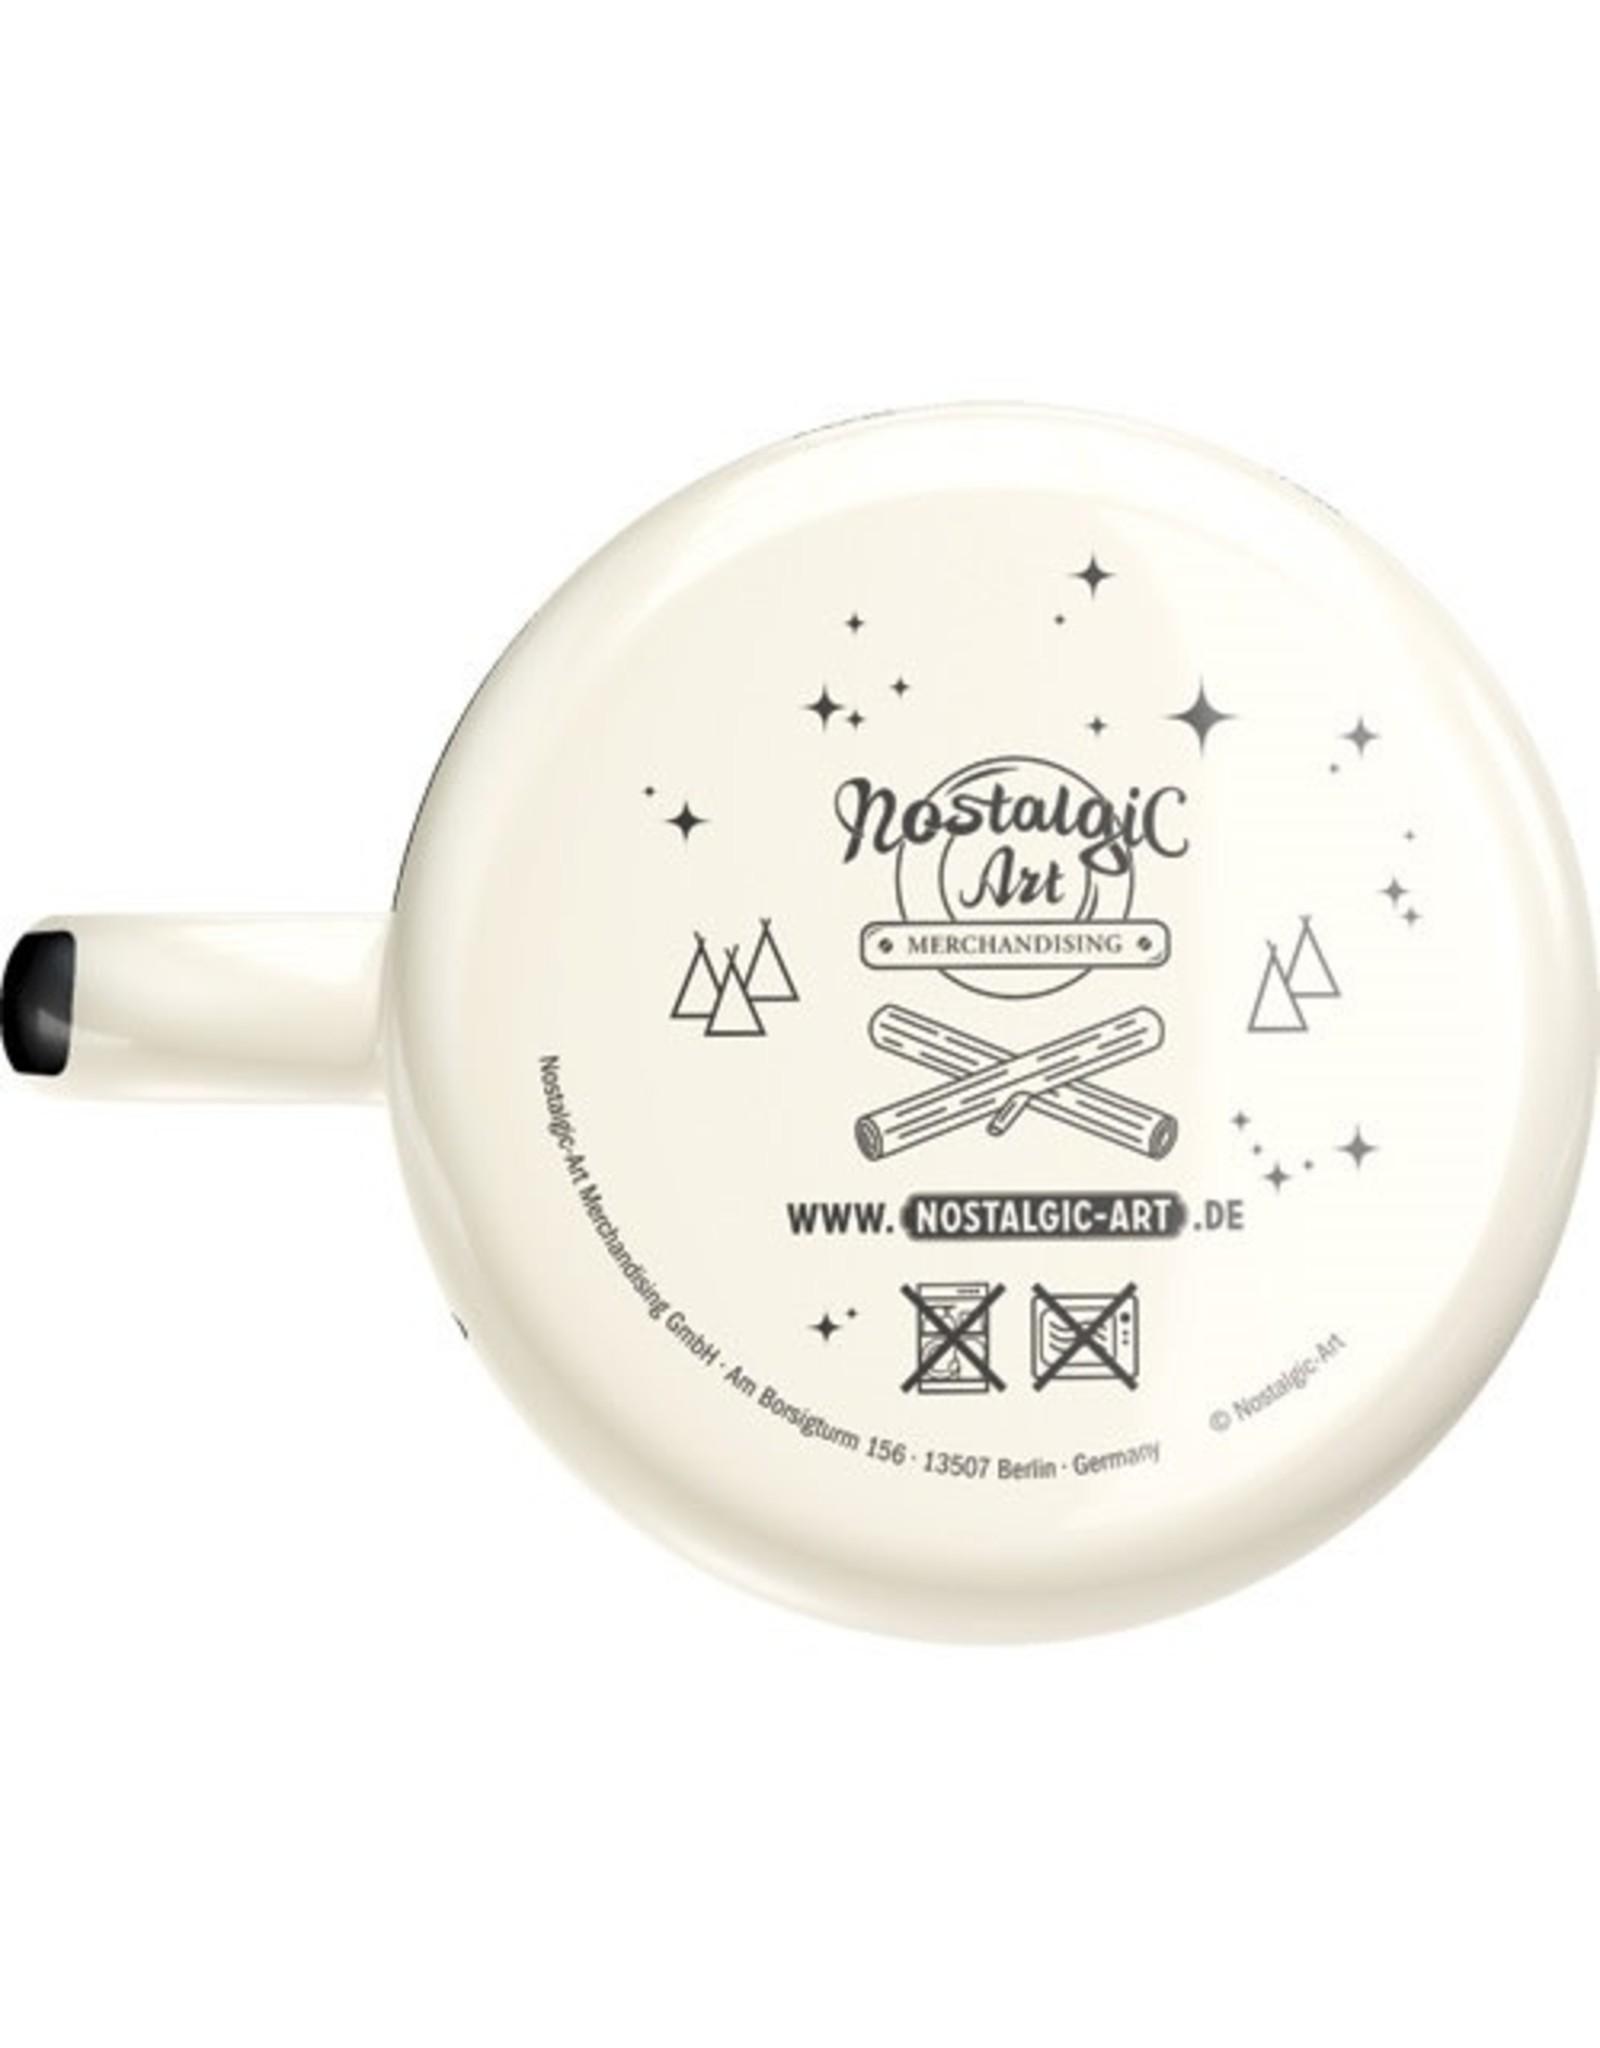 enamel mug with mountains print